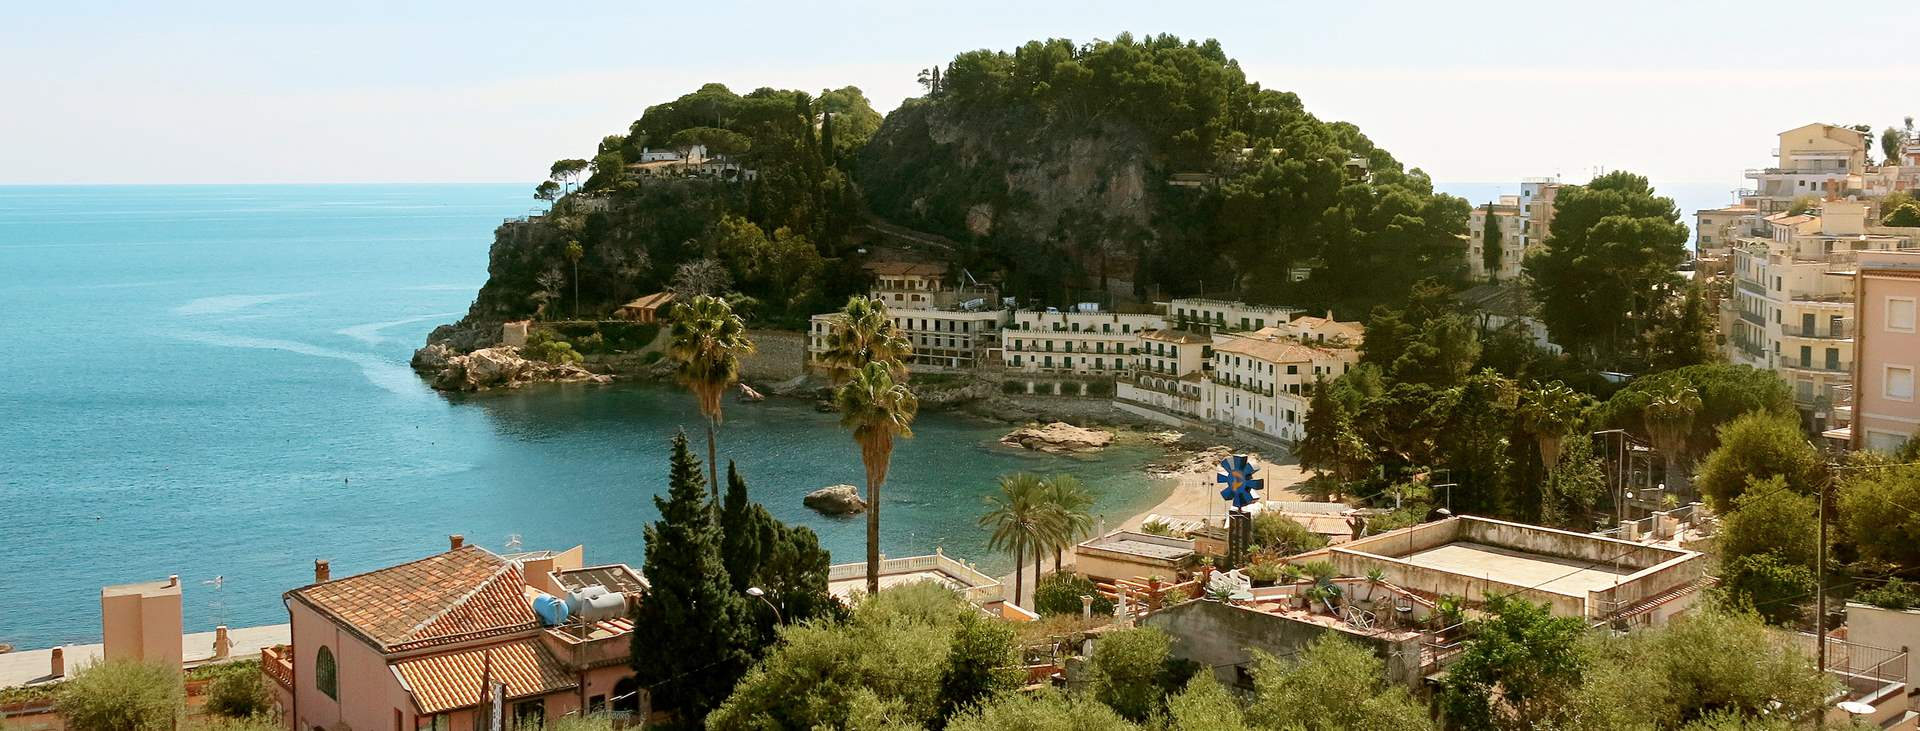 Bestill en reise med Ving til Taormina på Sicilia